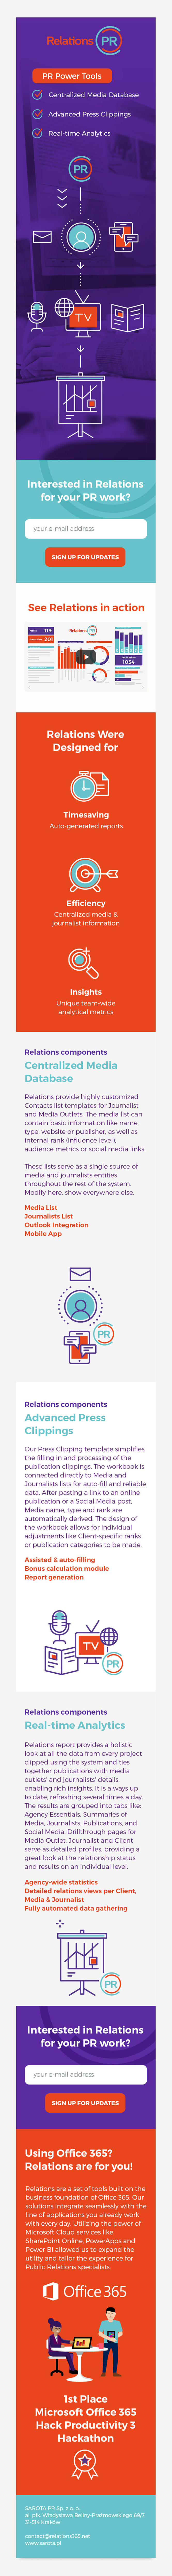 relations_strona mobile.jpg